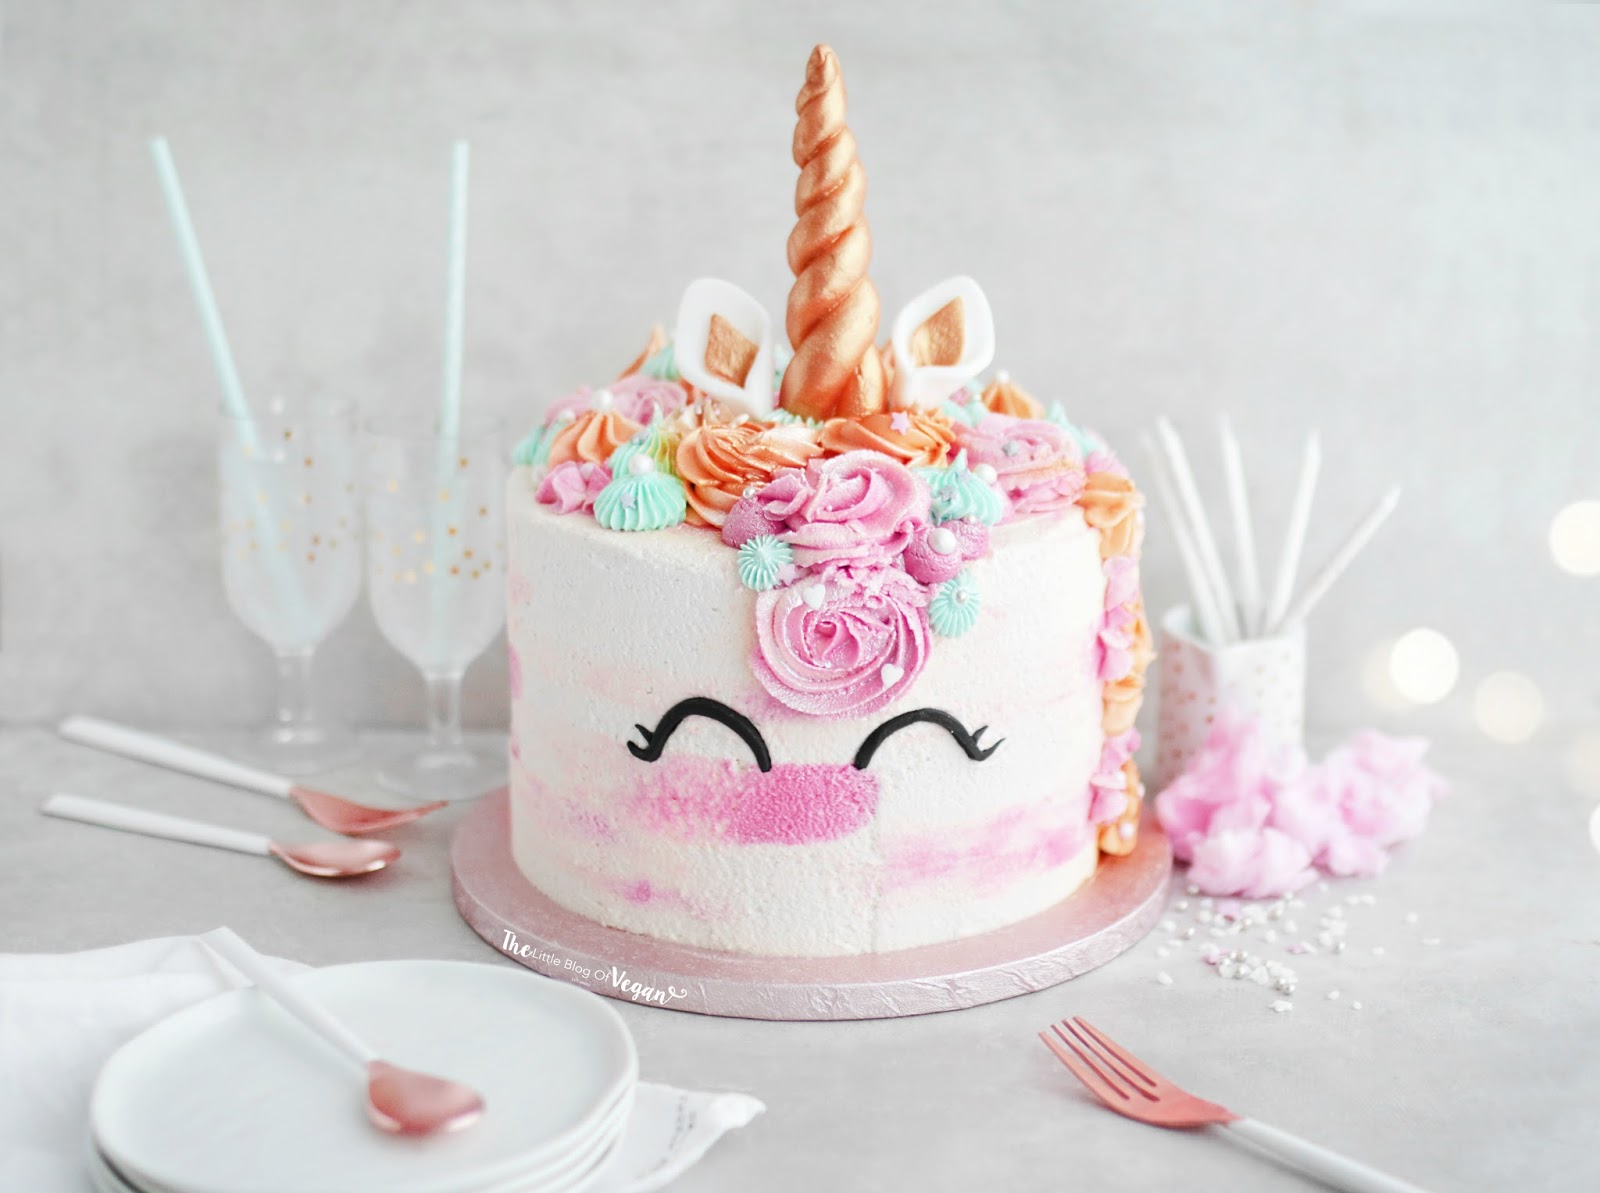 Vegan Unicorn Cake Recipe The Little Blog Of Vegan